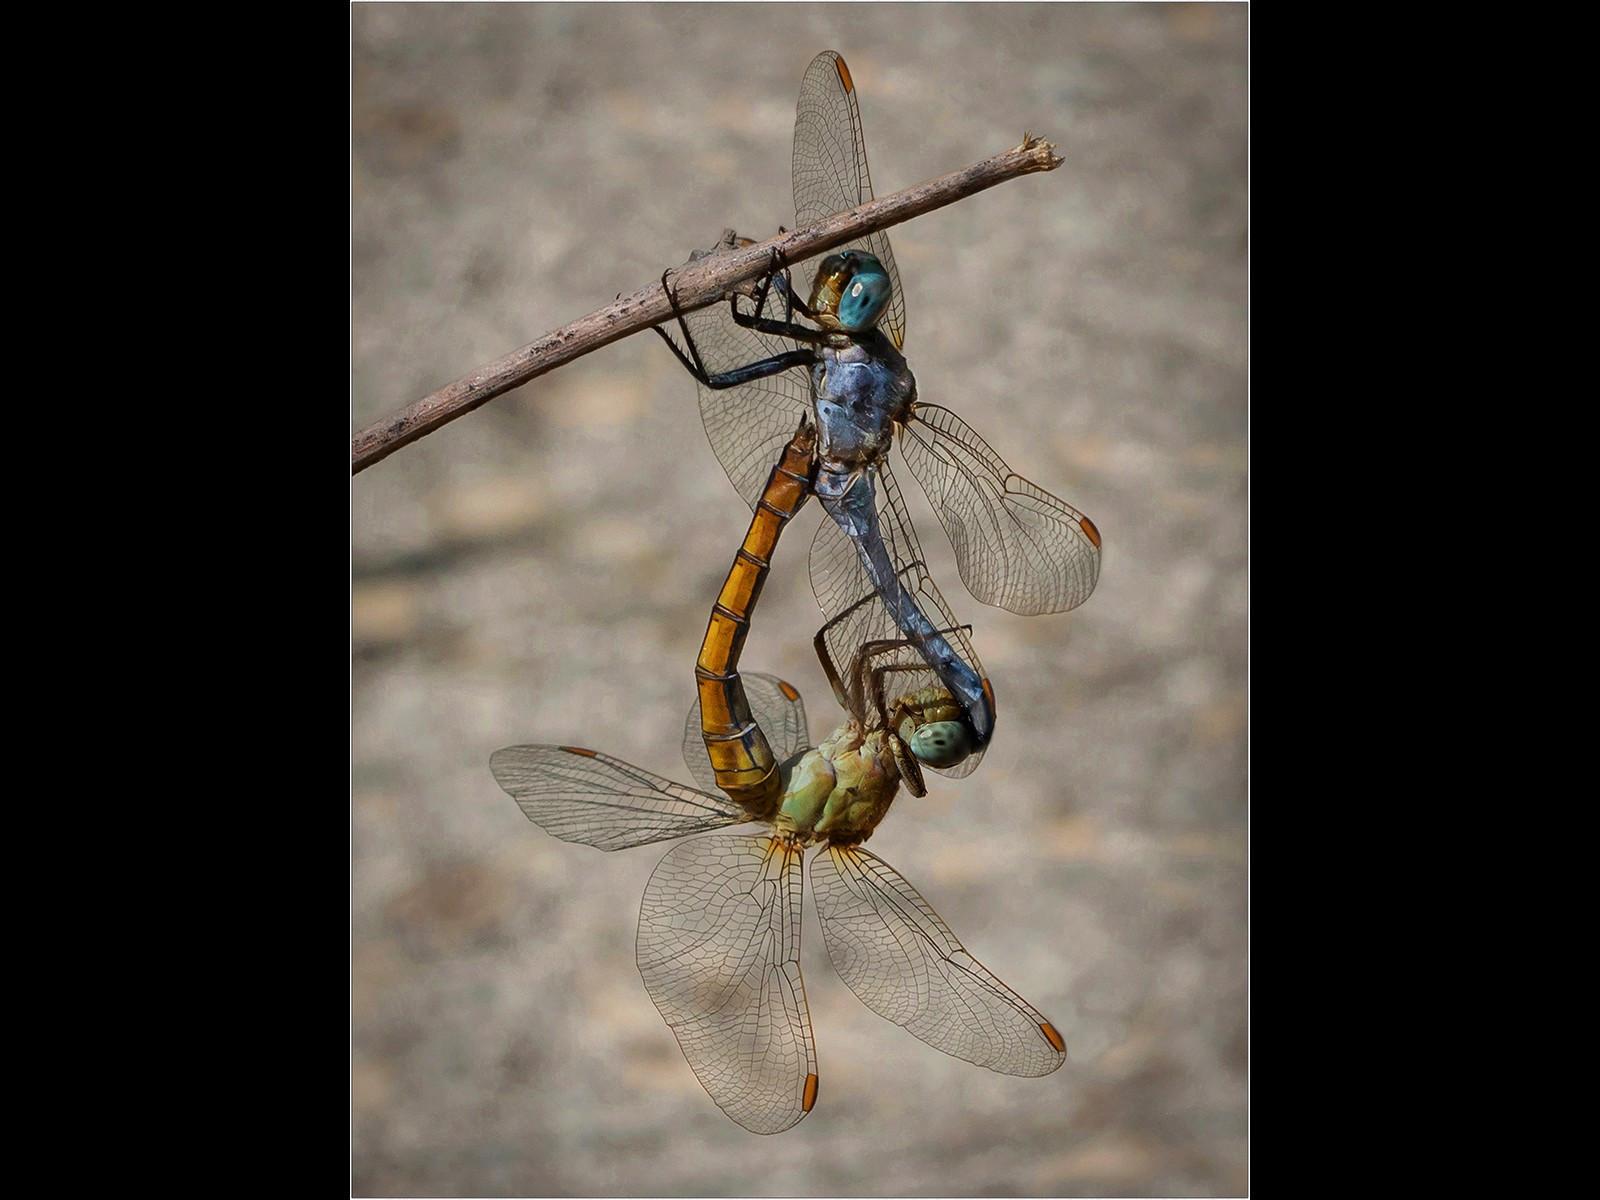 Keeled Skimmer Dragonflies - Mating